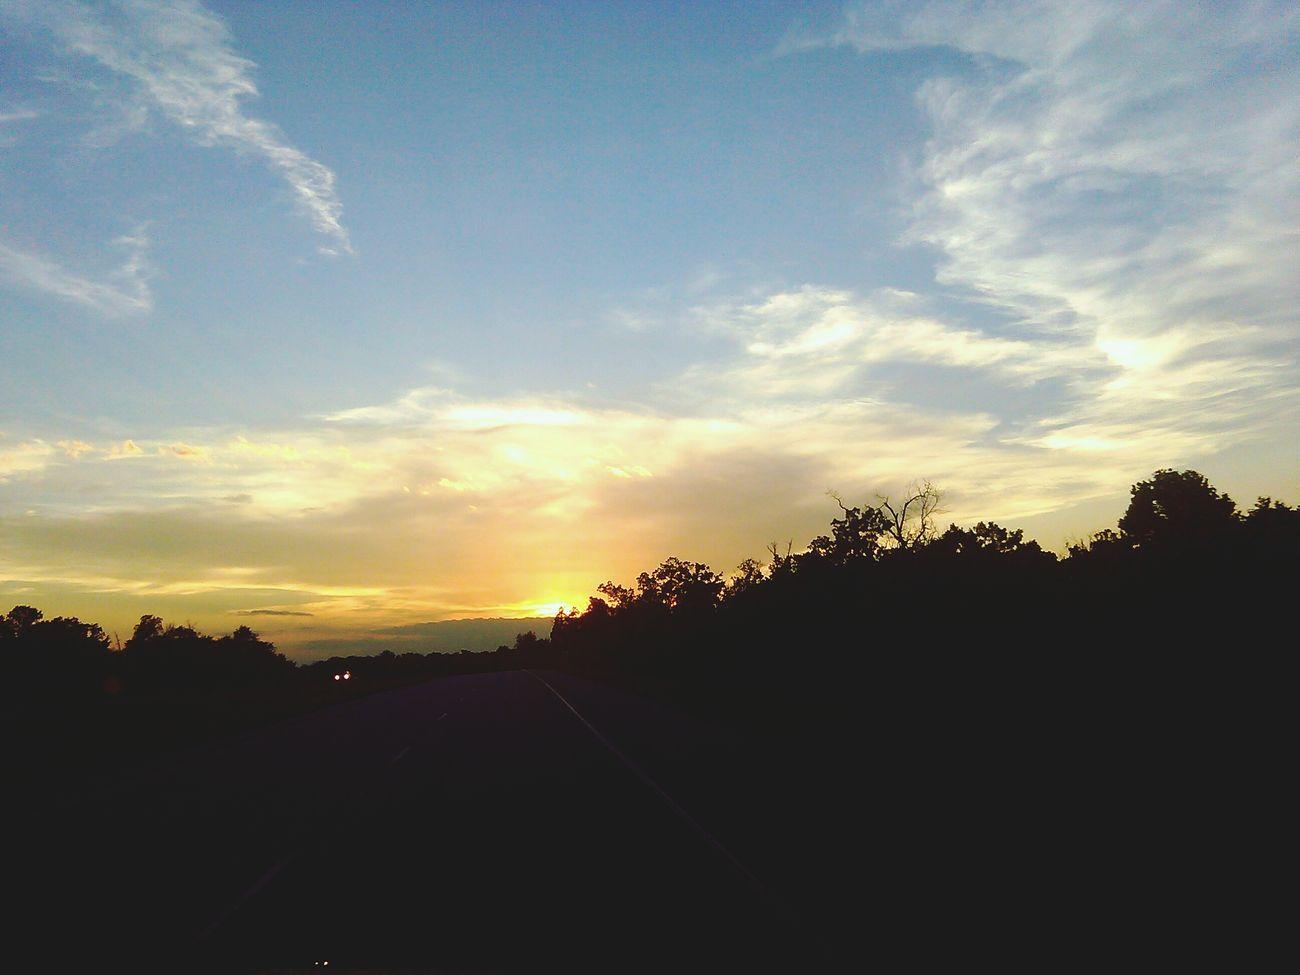 Bentonville, Arkansas Beautiful Arkansas Sunset Silhouettes Sunsetporn Firesky Peace ✌ Naturelovers Beautiful Nature